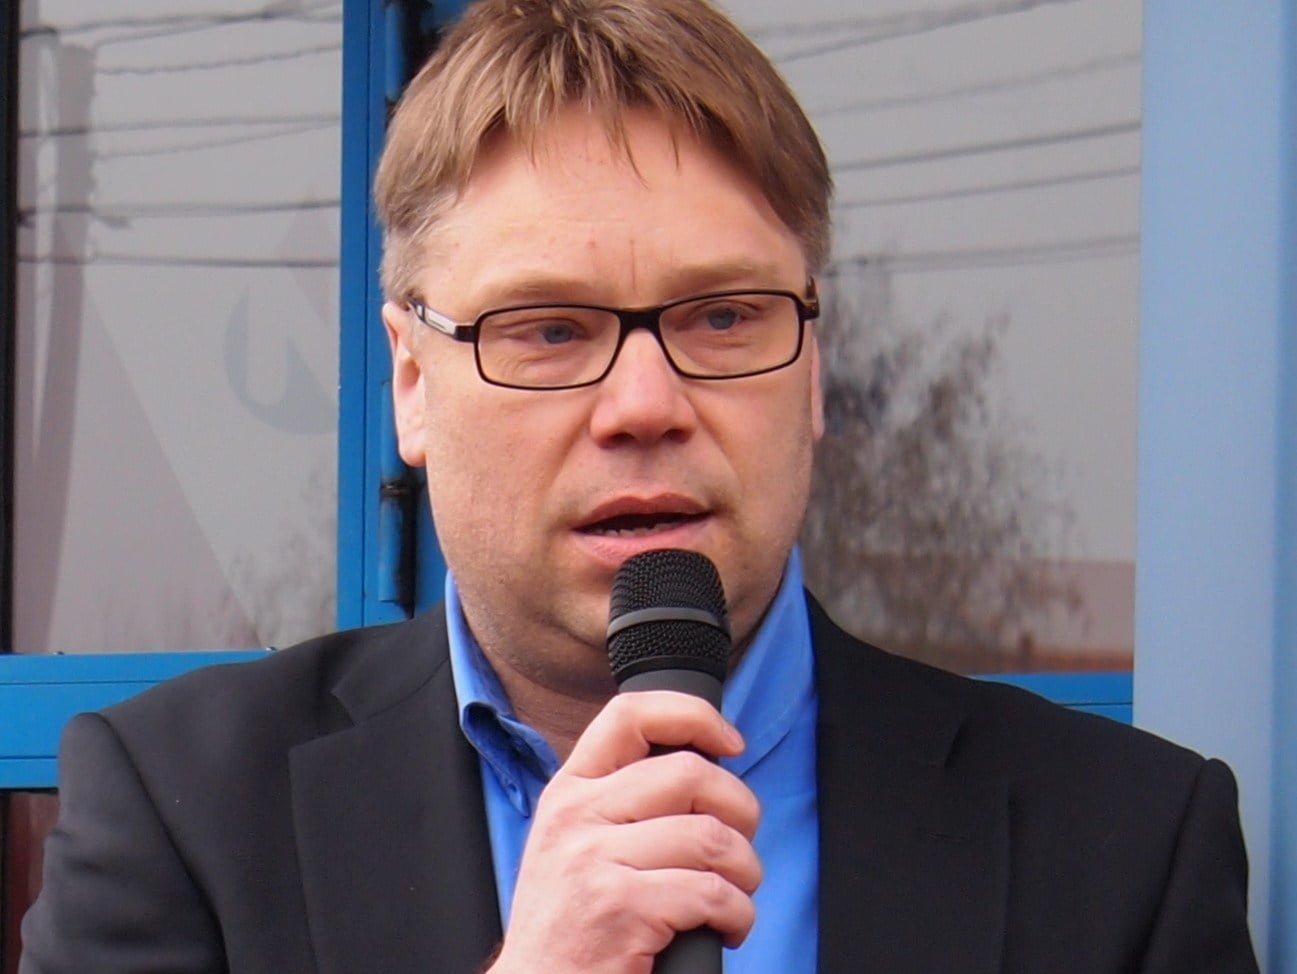 Jarmo Nieminen